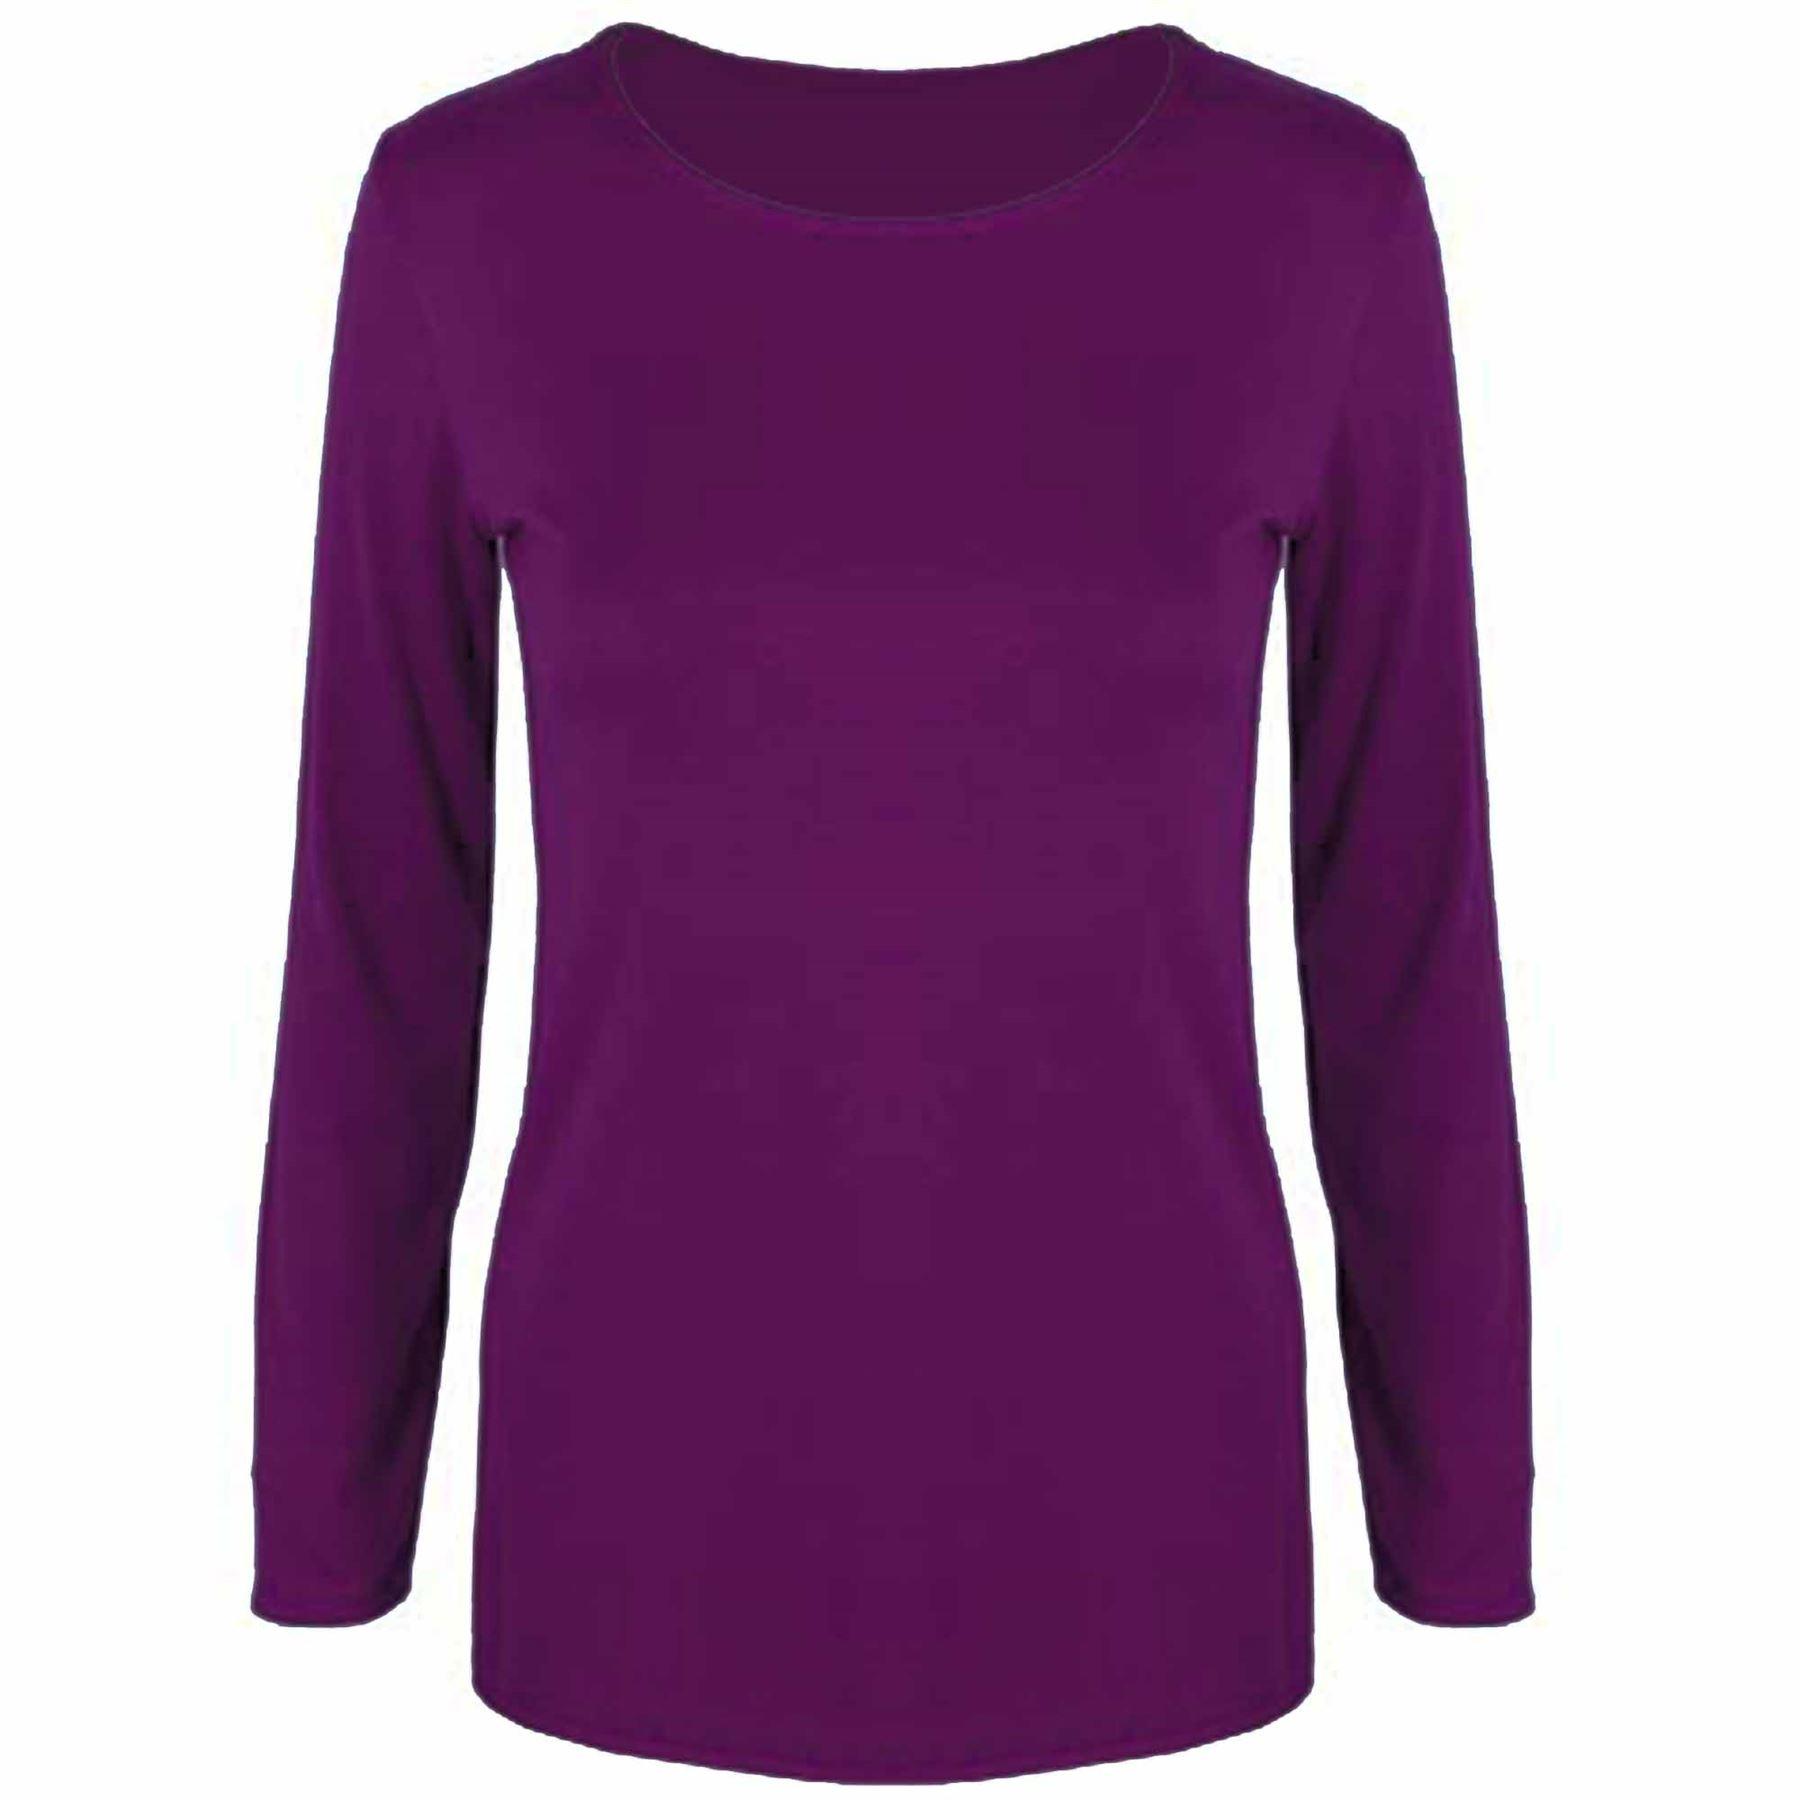 Womens t shirt ladies plain casual long sleeve fit round for Long sleeve womens t shirts